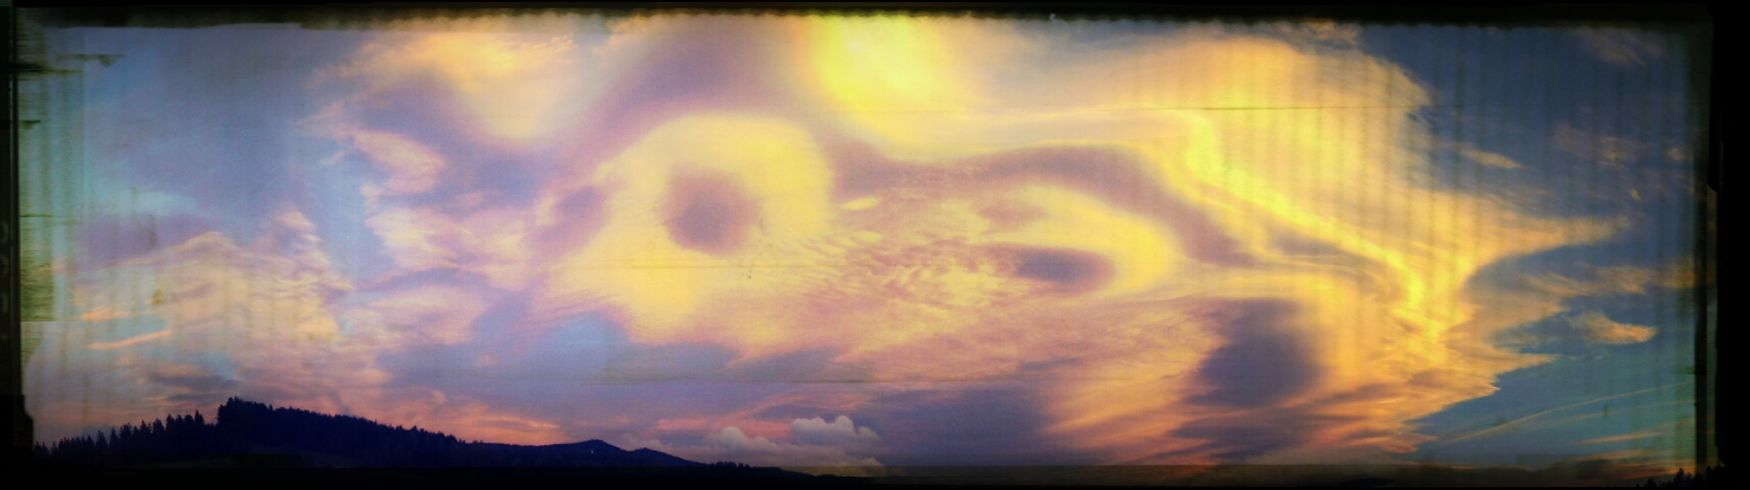 Clouds Sunset Sky Enjoying The Sunset Clouds And Sky